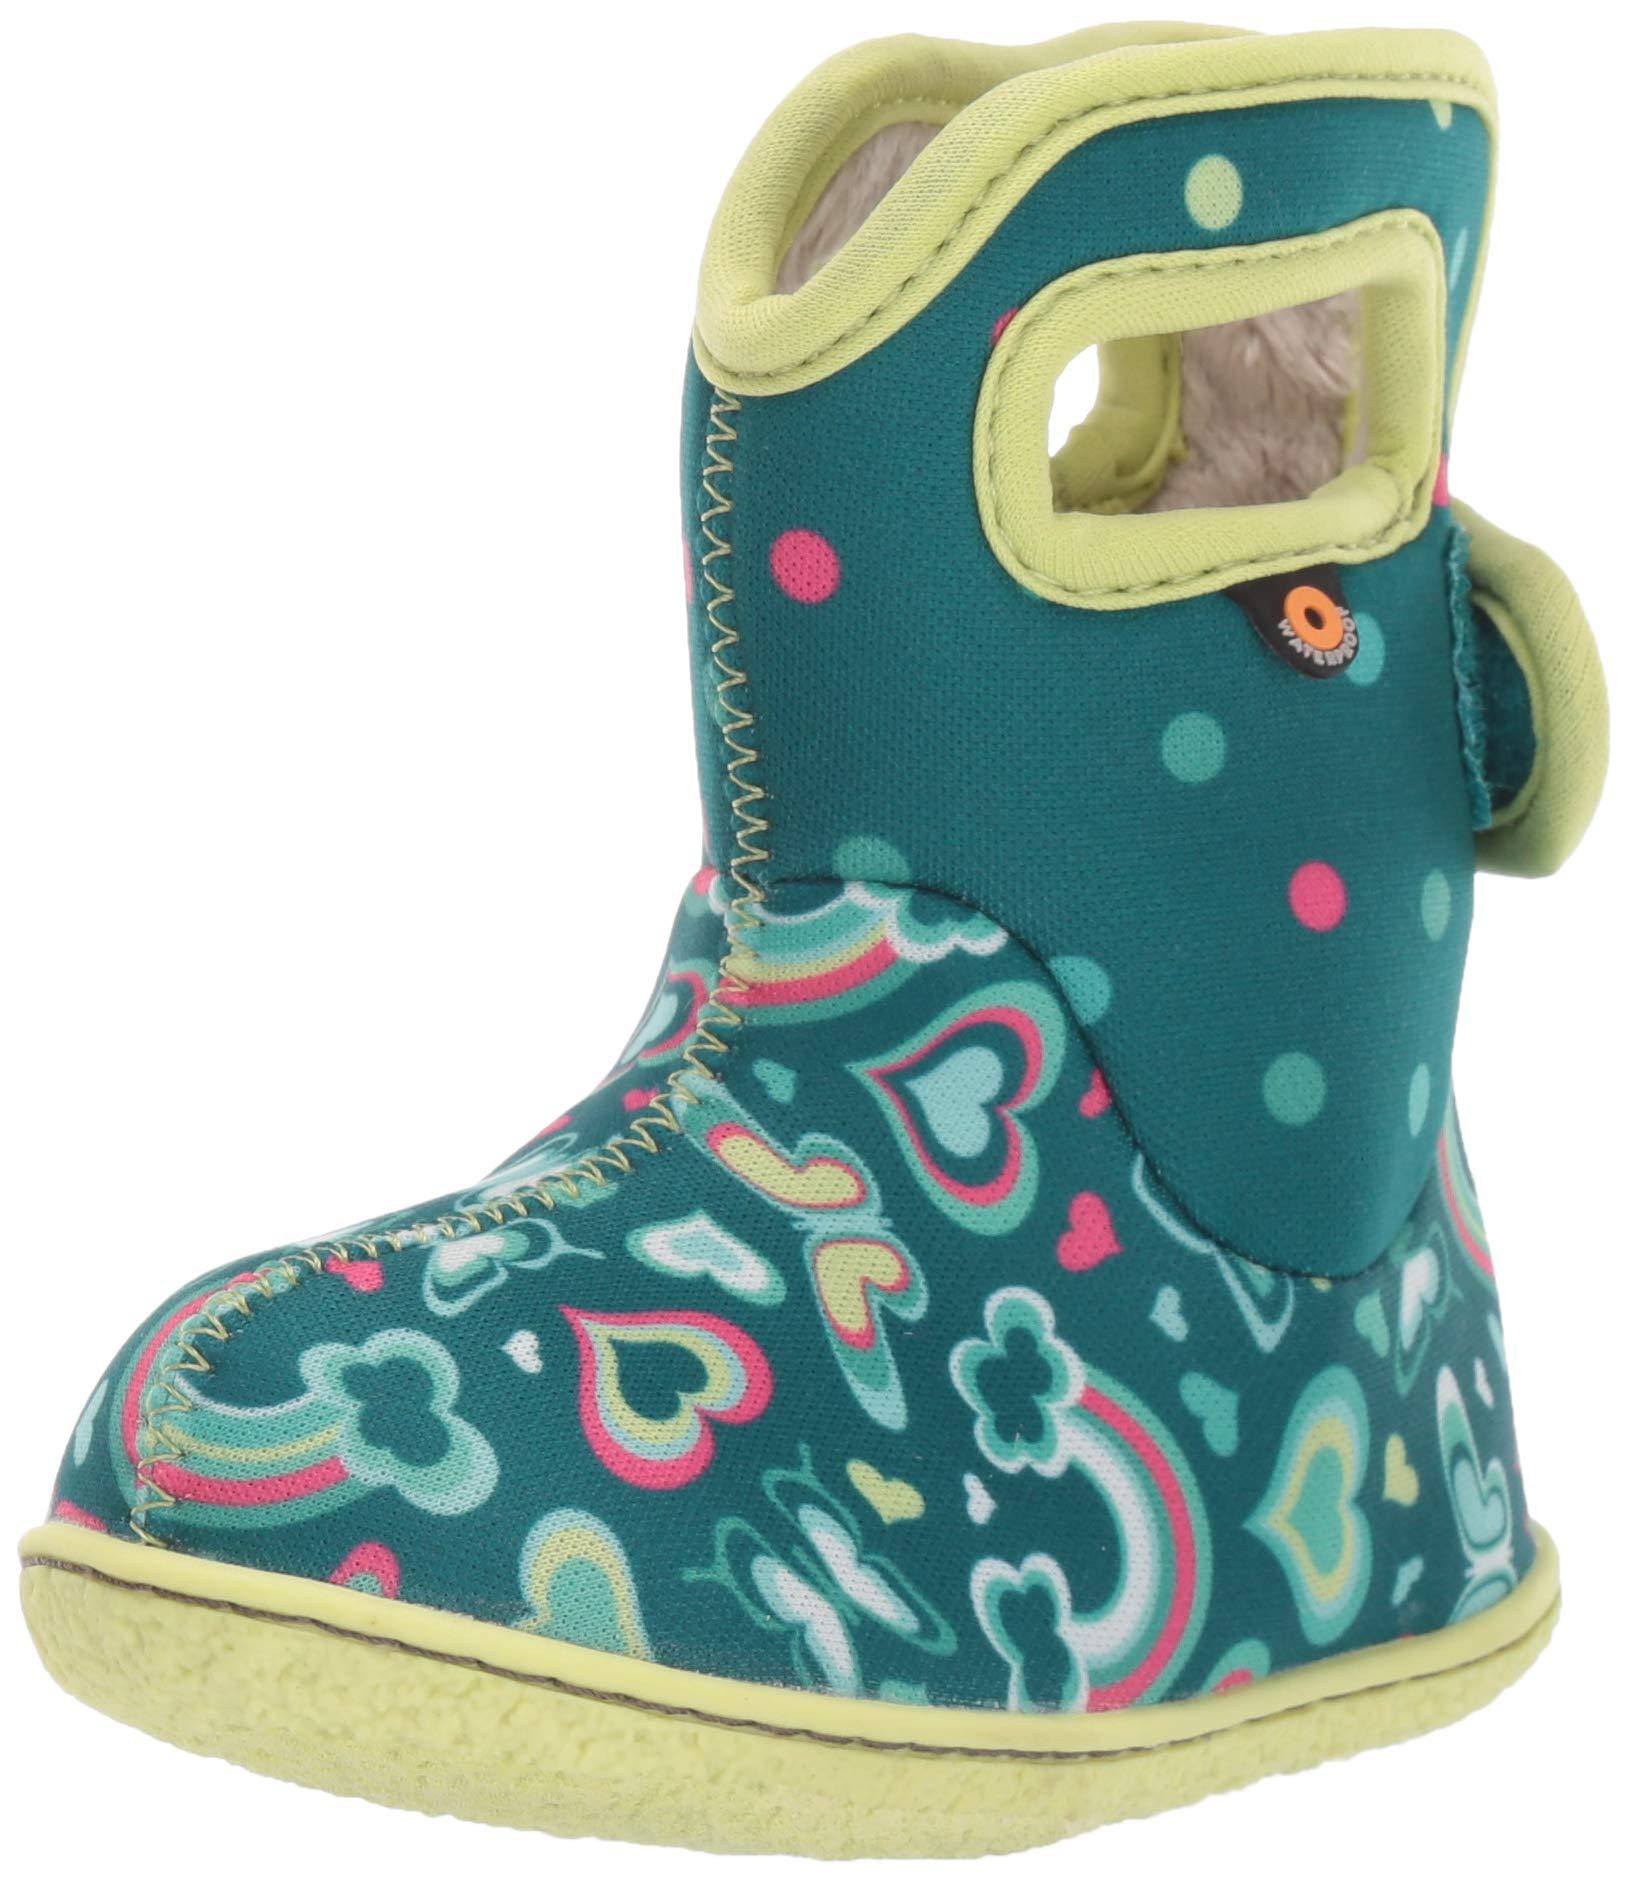 BOGS Kids' Baby Waterproof Insulated Crib Shoe